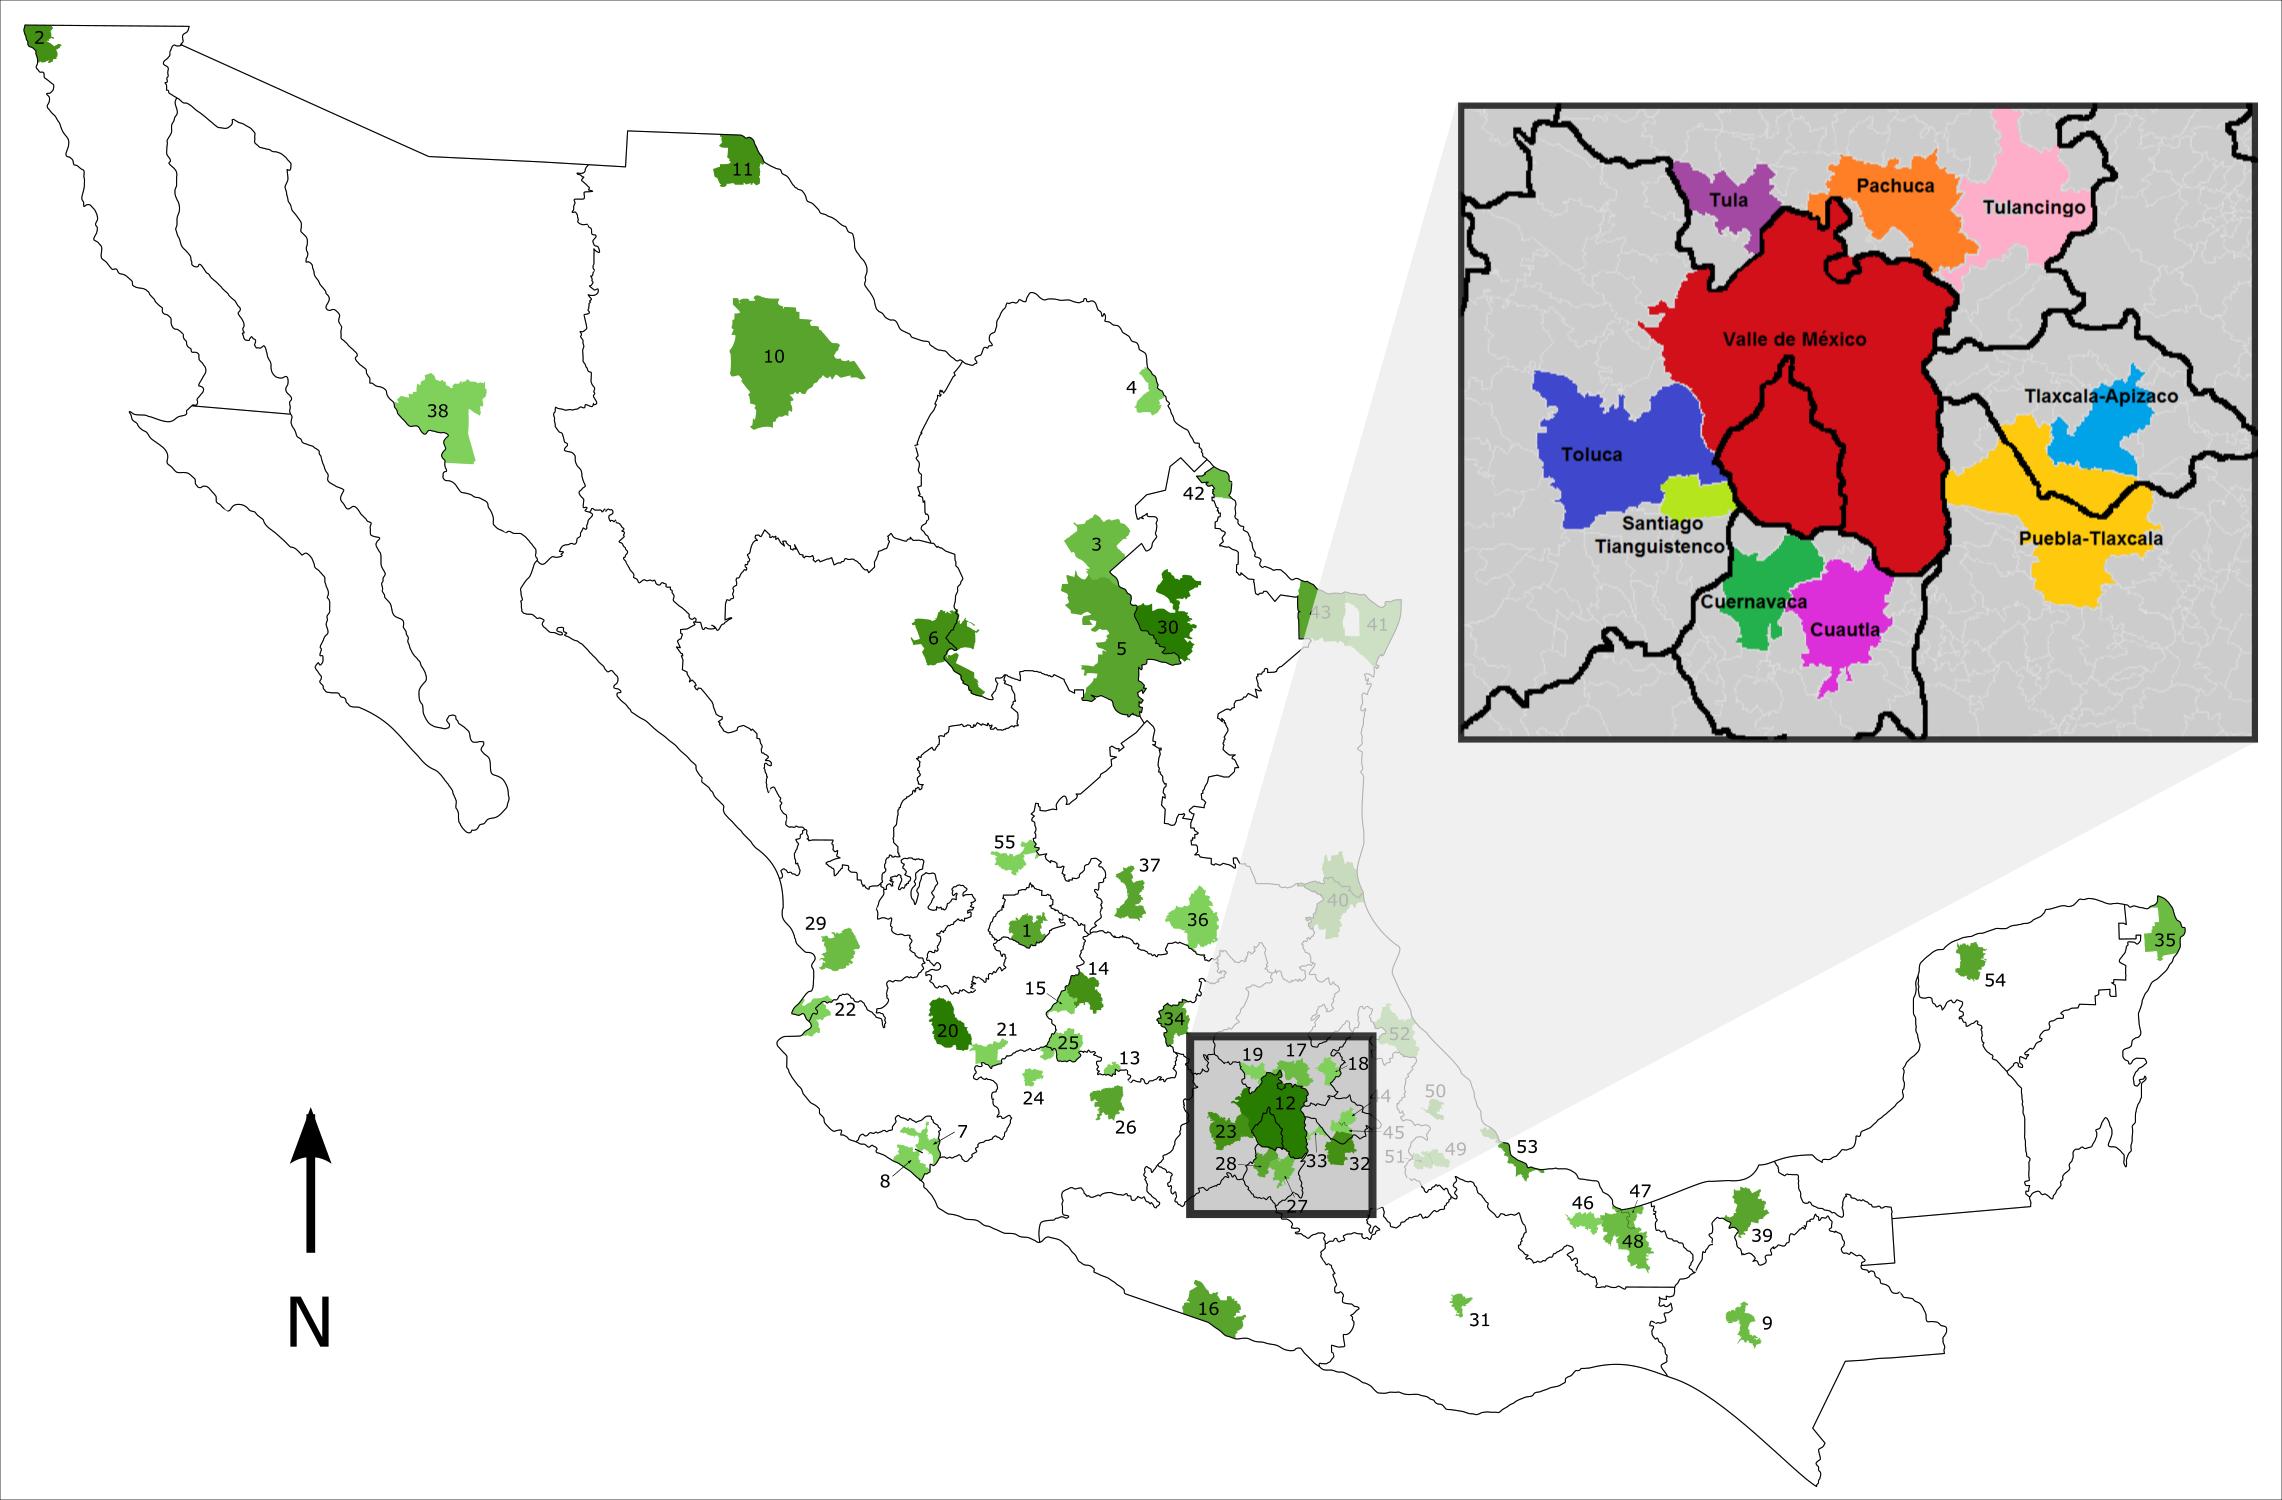 Corona Regional Del Centro De Mexico Wikipedia La Enciclopedia Libre